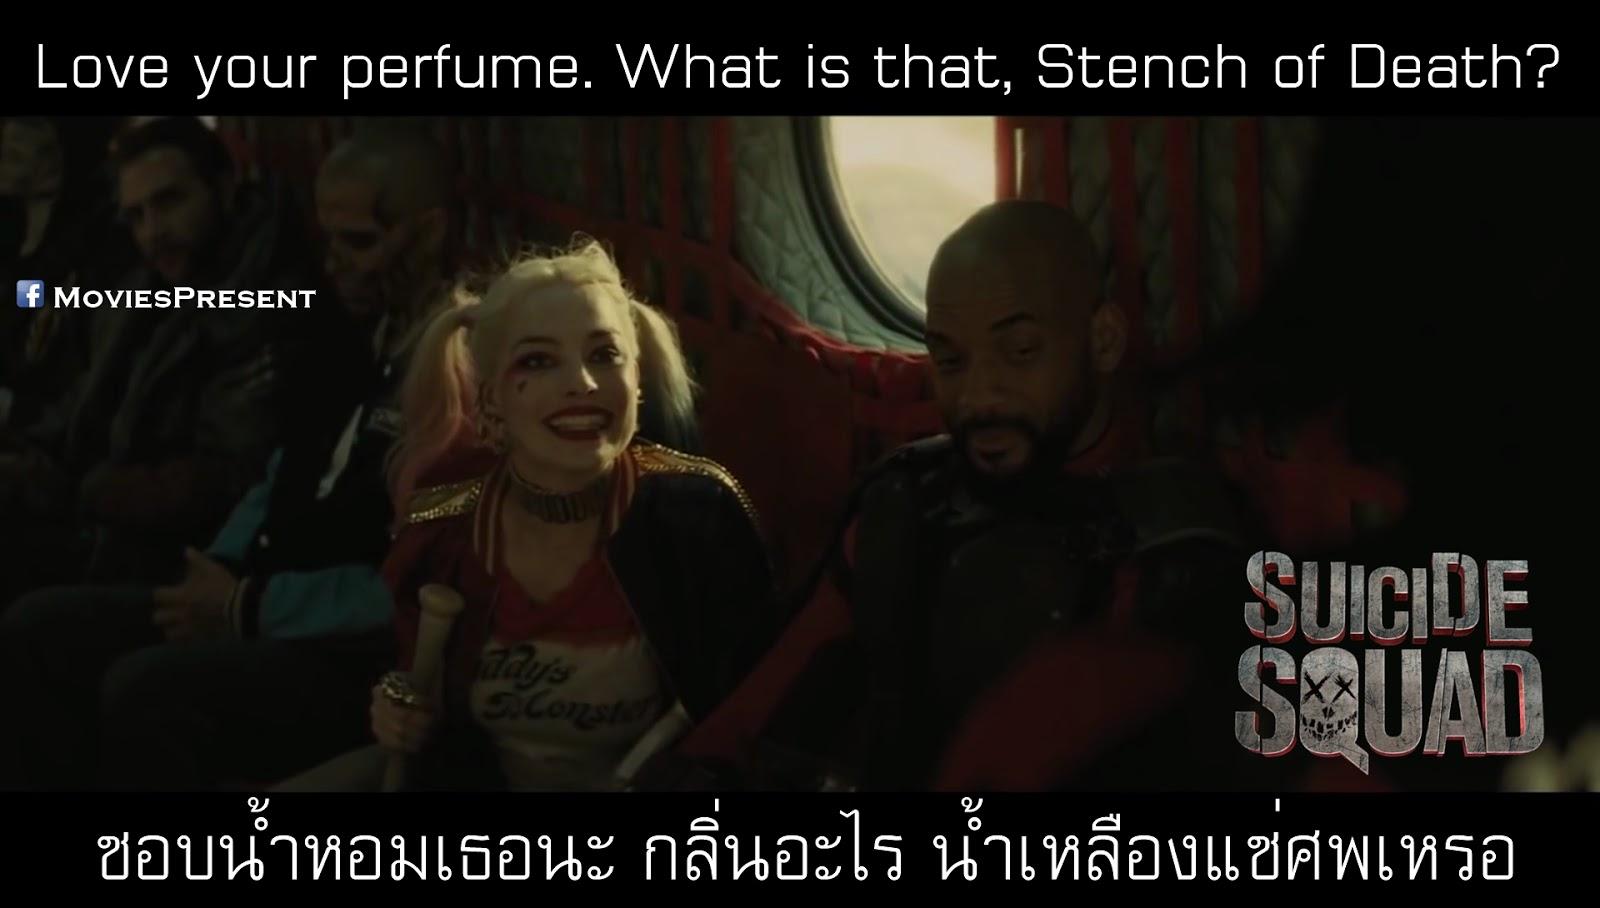 MoviesQuotes By MoviesPresent: Suicide Squad ทีมพลีชีพมหา